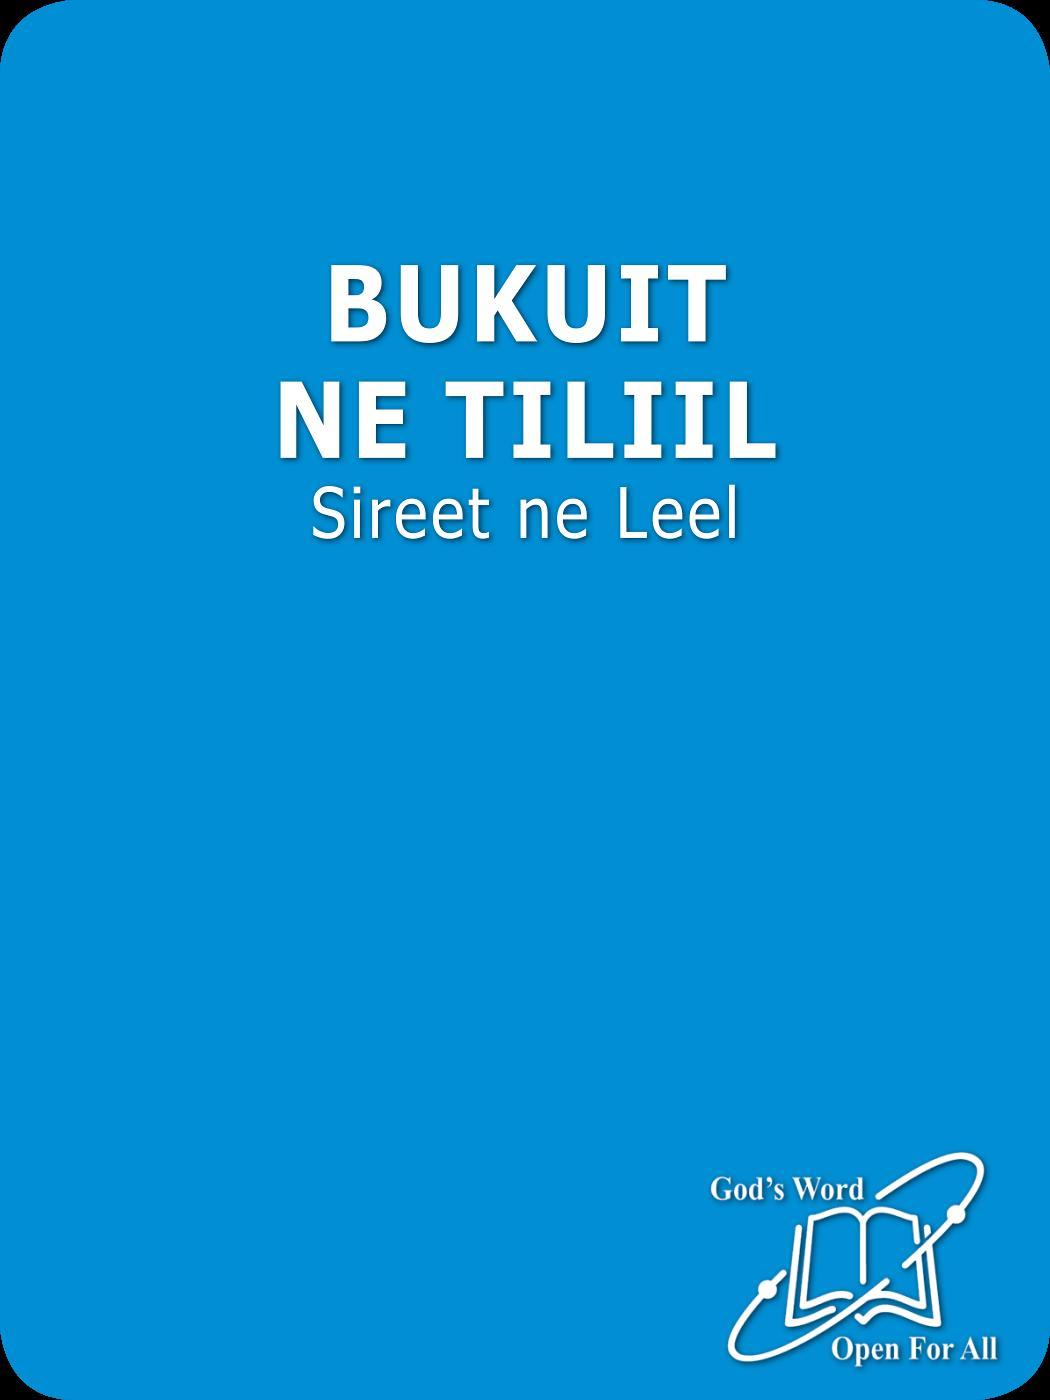 Revised Kalenjin Bible